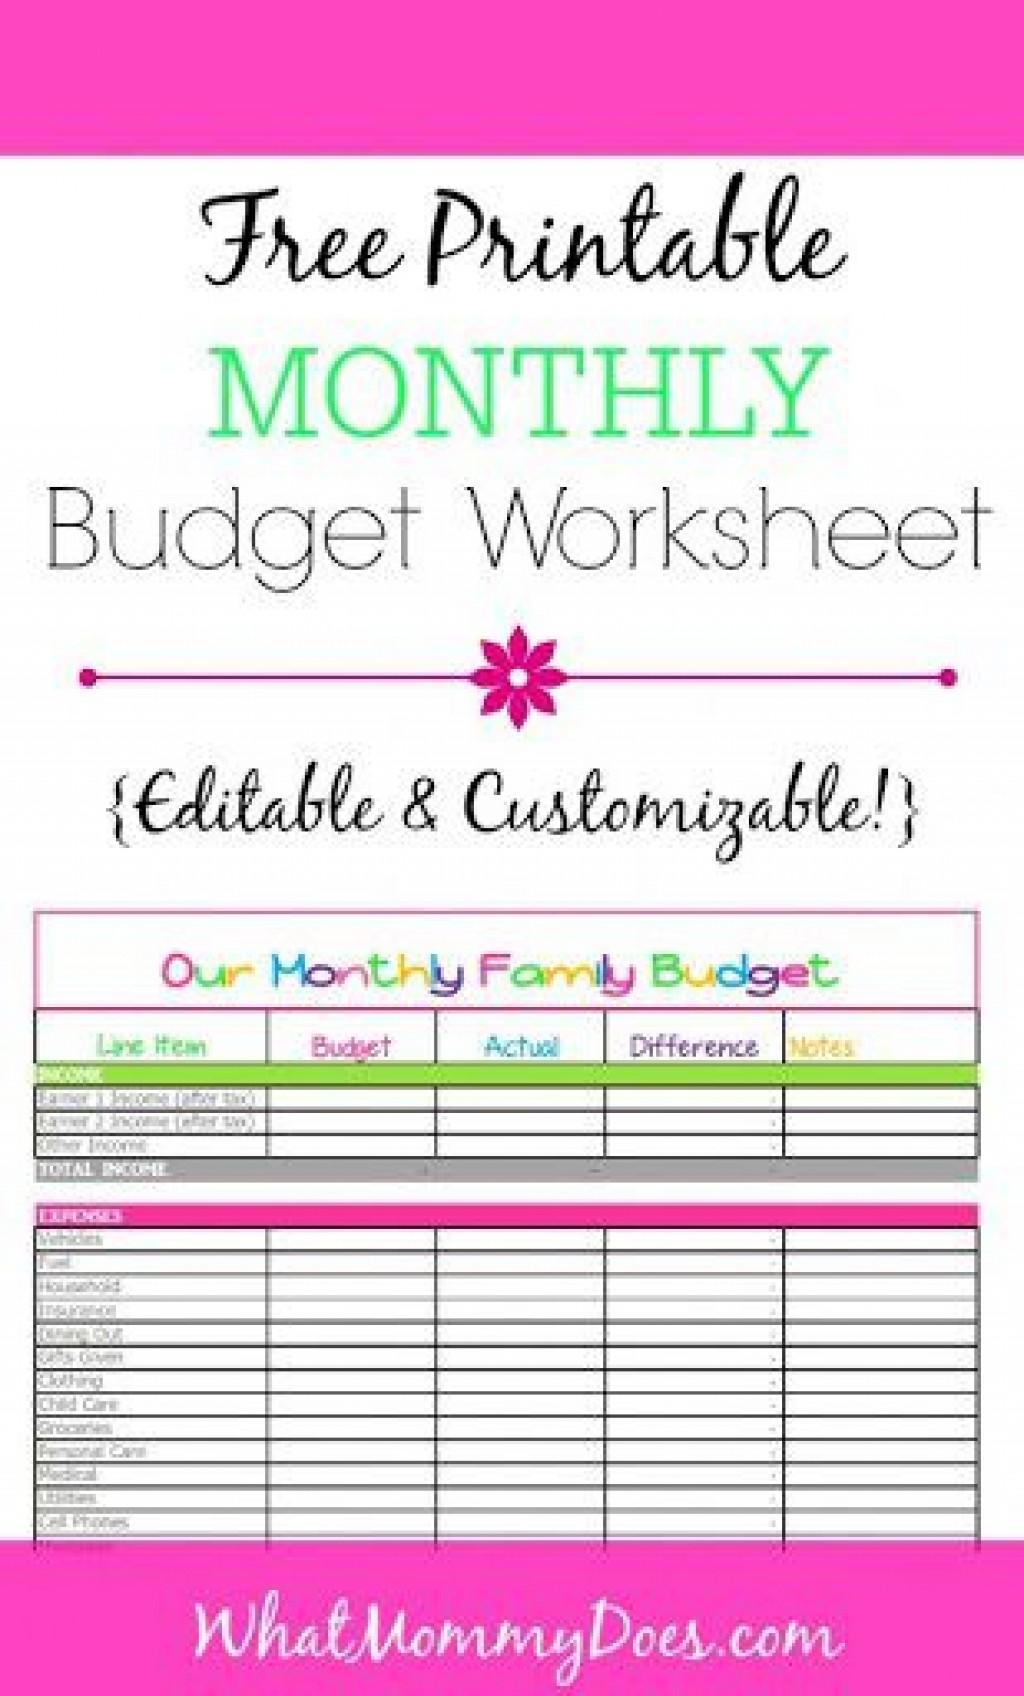 000 Striking Free Printable Monthly Budget Form Sample  Simple Template Blank Household SheetLarge